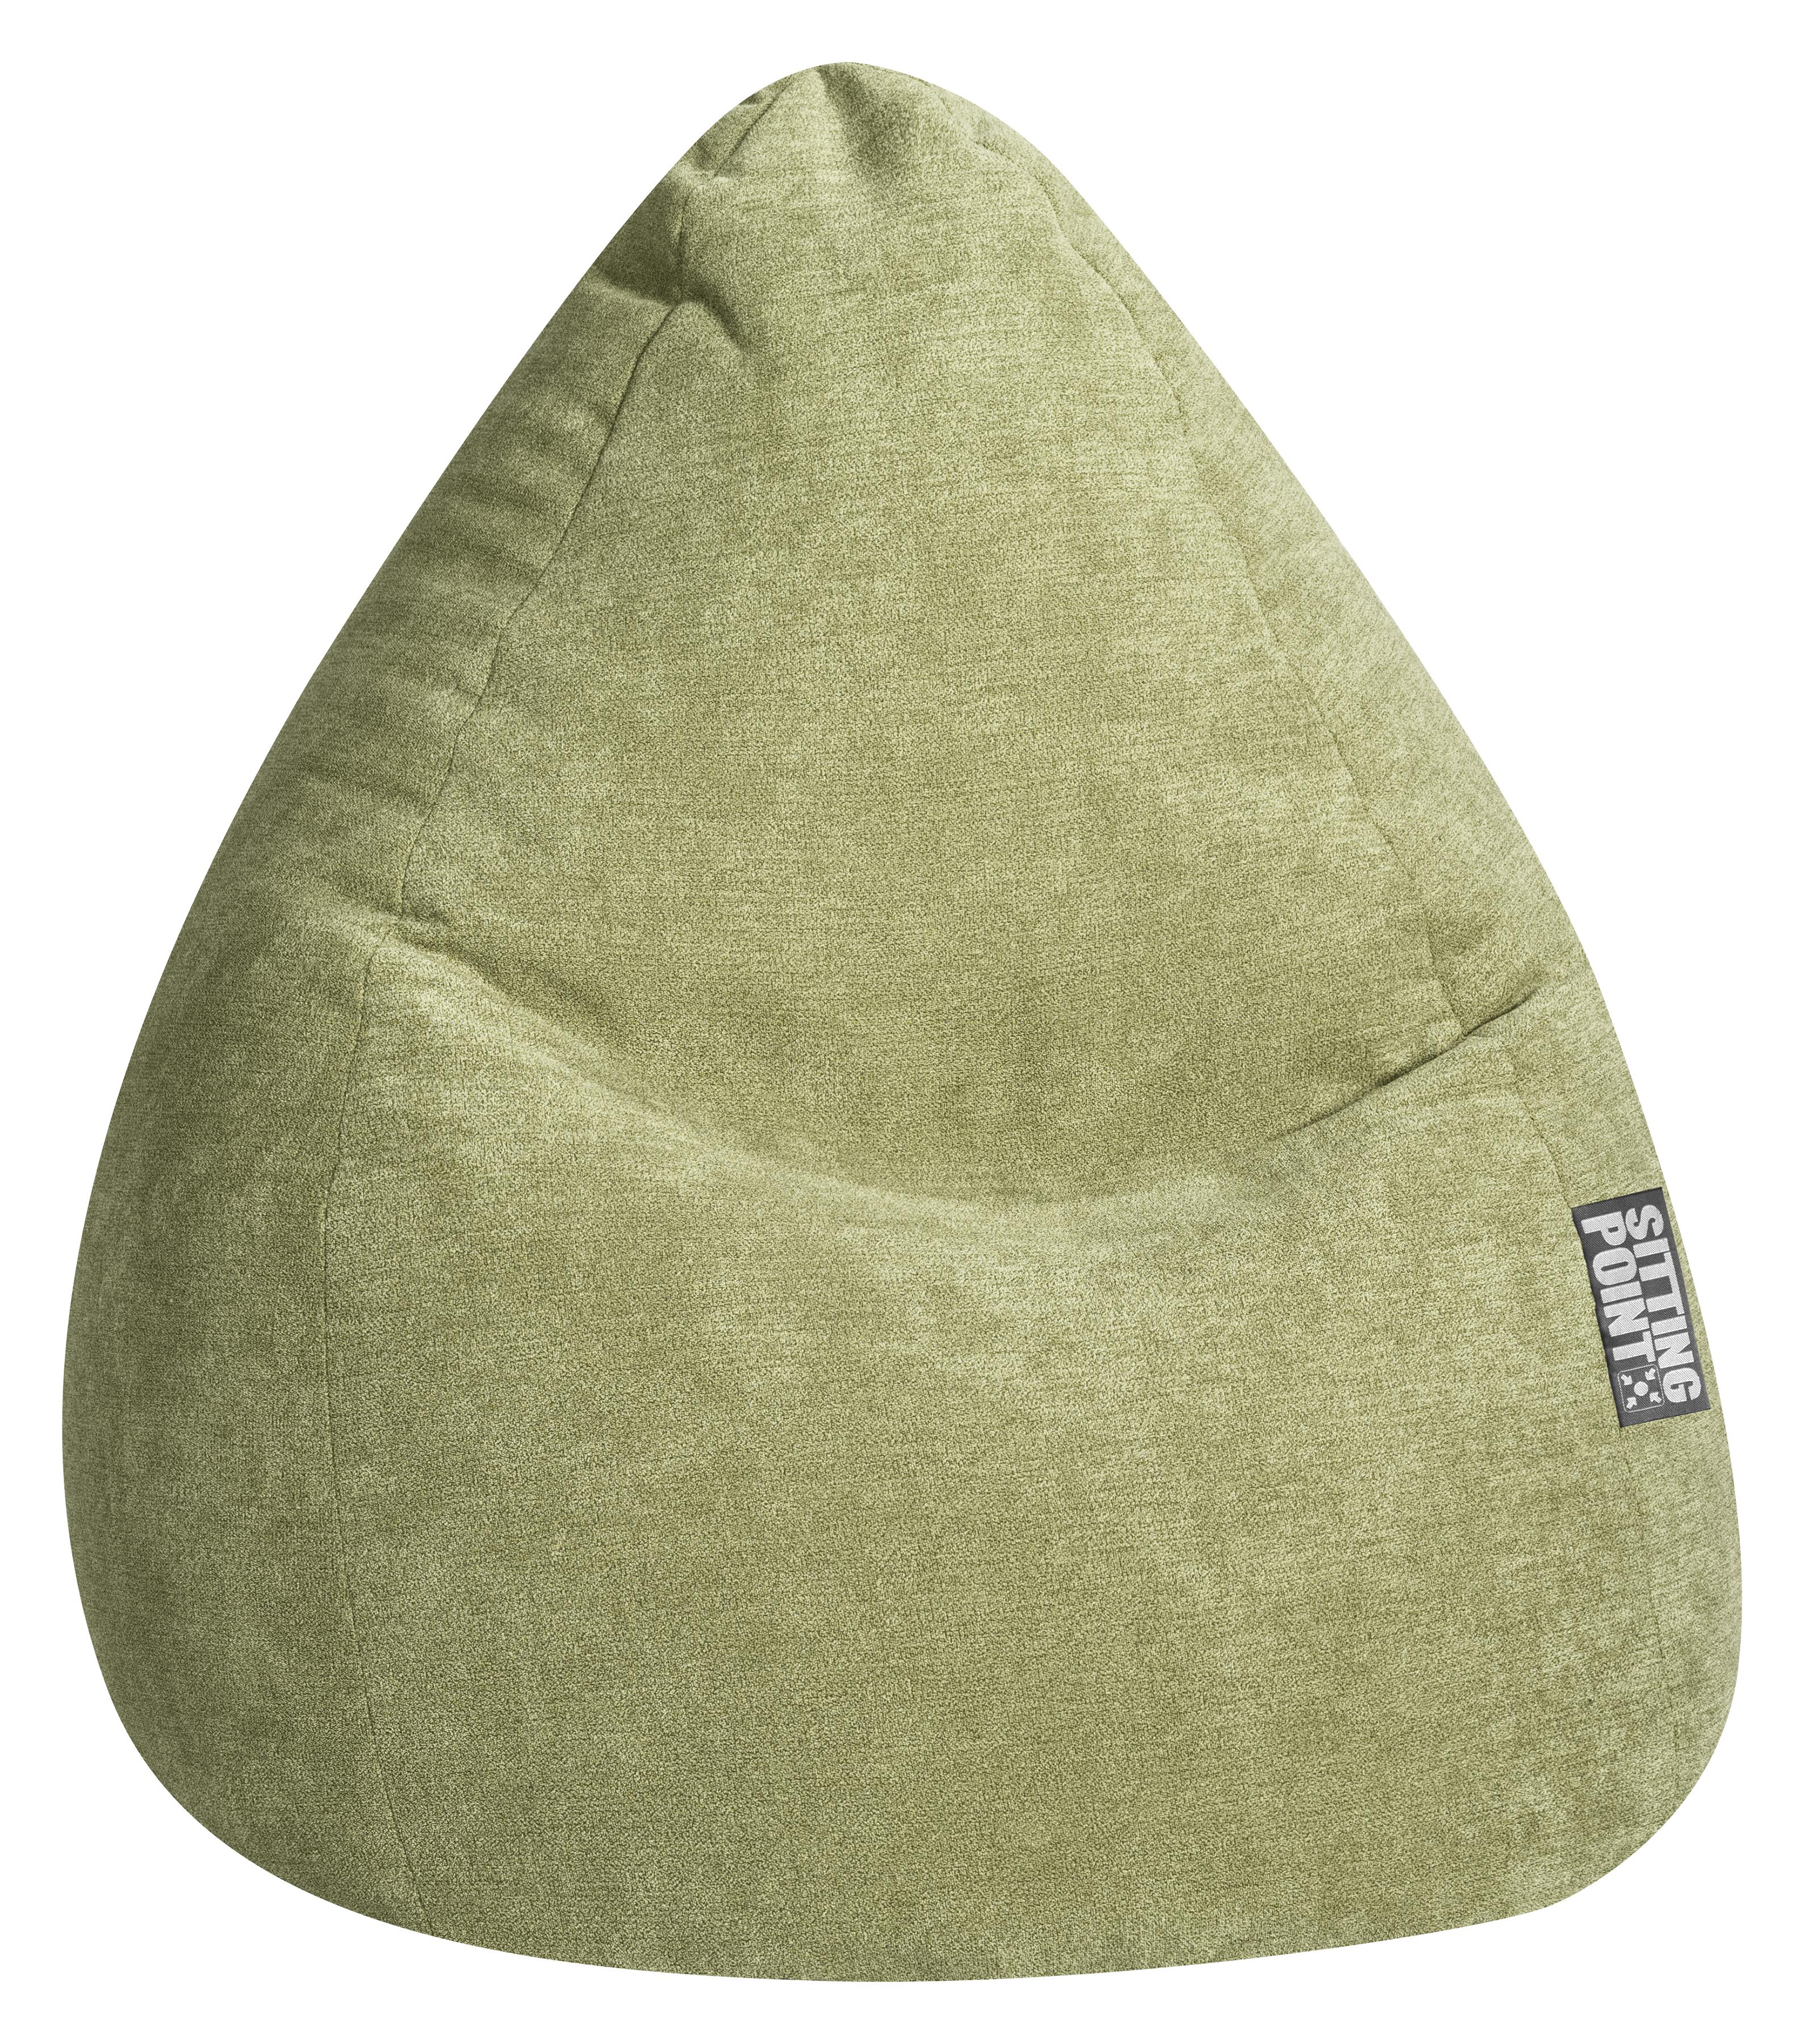 Pouf design d'intérieur en tissu vert